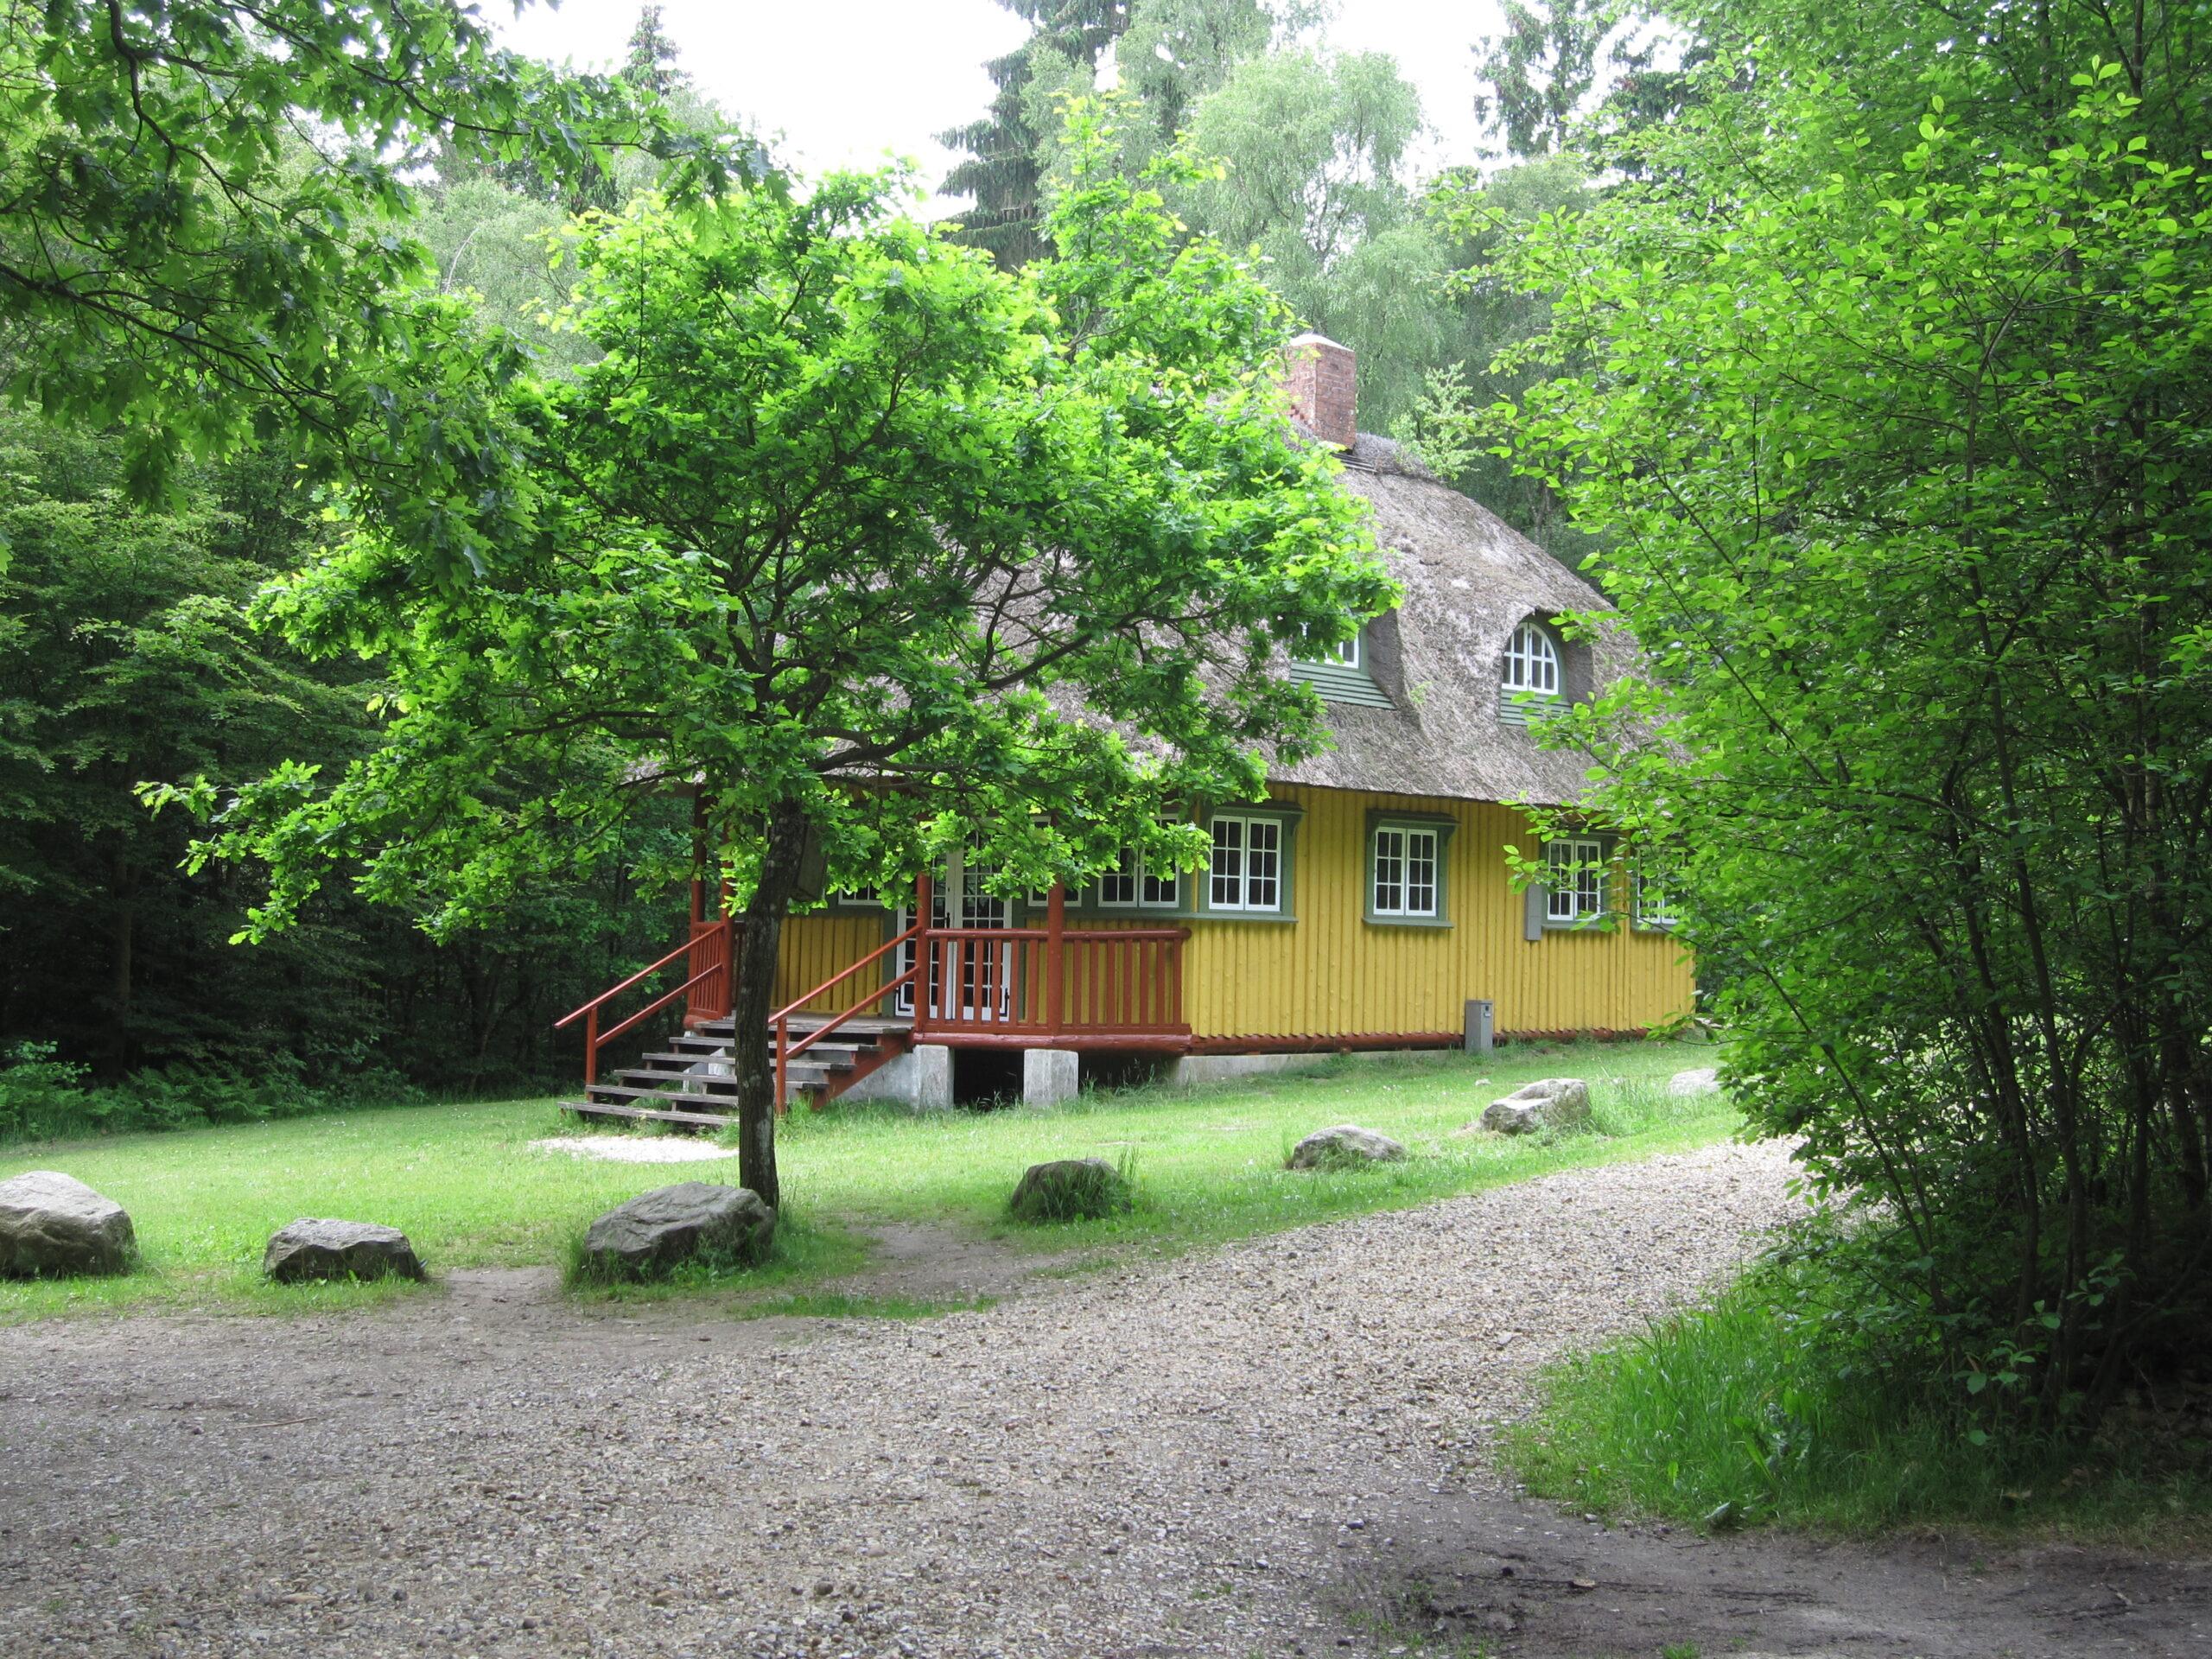 Jægerhytten i Hjermind Skov ved Bjerringbro